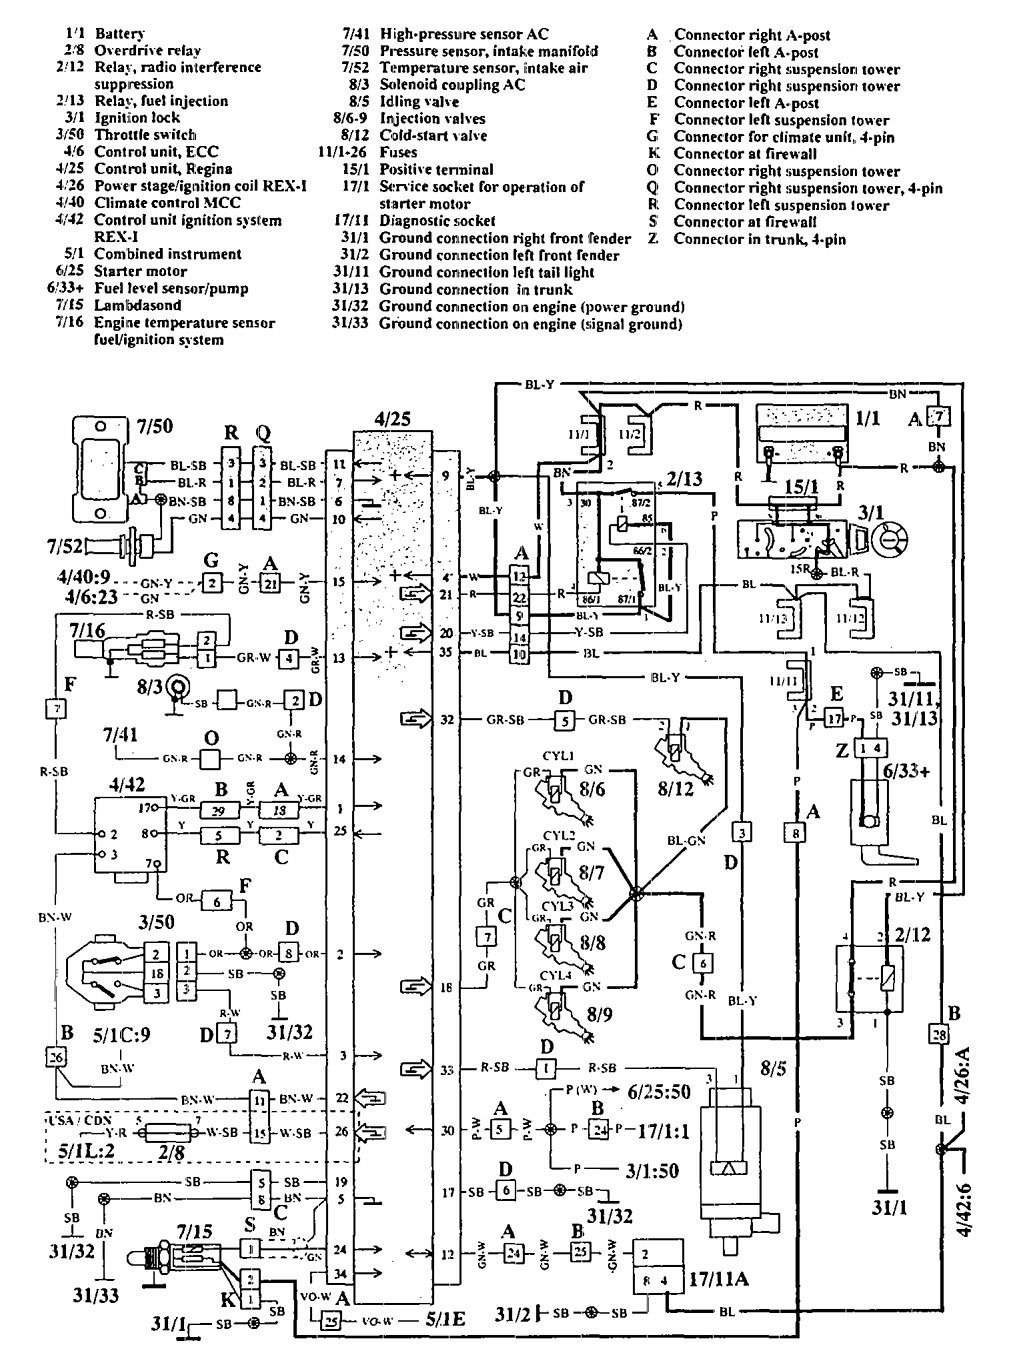 1992 Volvo 940 Radio Wiring - Lir Wiring 101 on sailboat electrical diagram, wellcraft parts catalog, wellcraft electrical schematic, wellcraft electrical wiring,